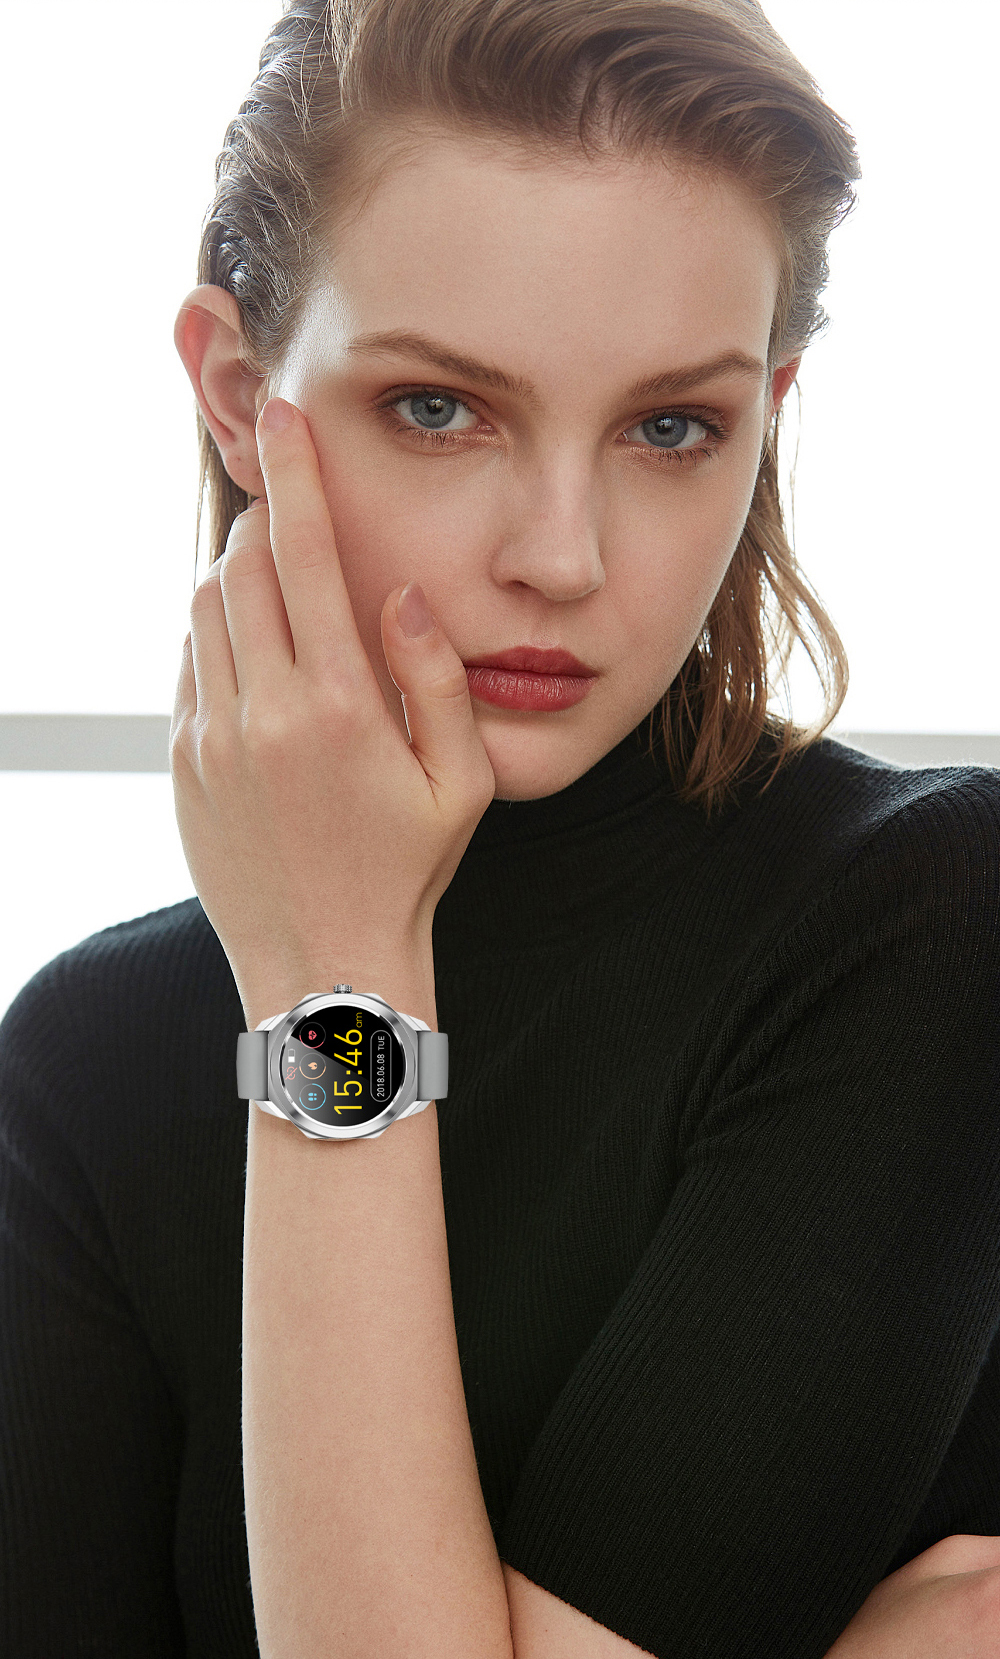 esportes relógio para android ios xiaomi iphone smartwatch